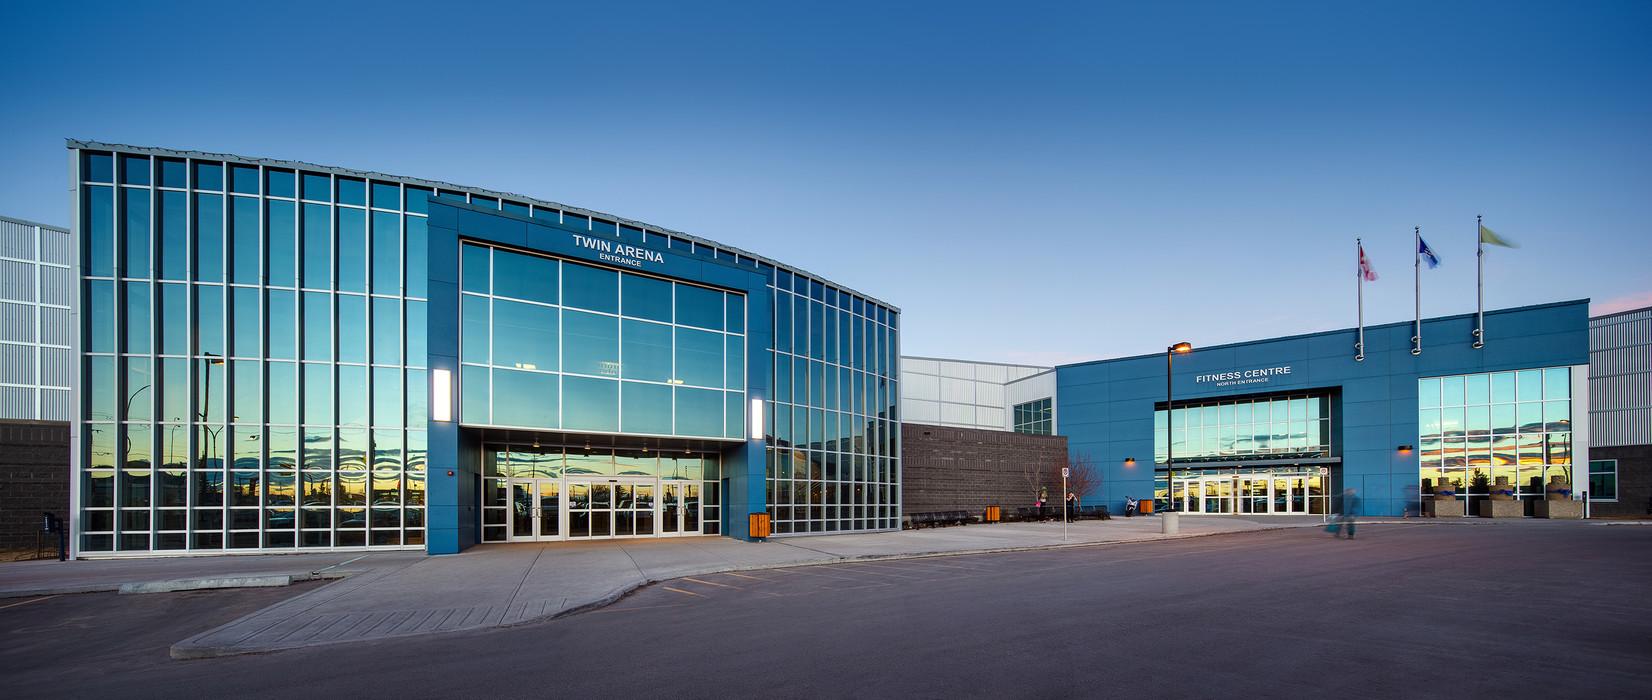 Genesis Place Arena